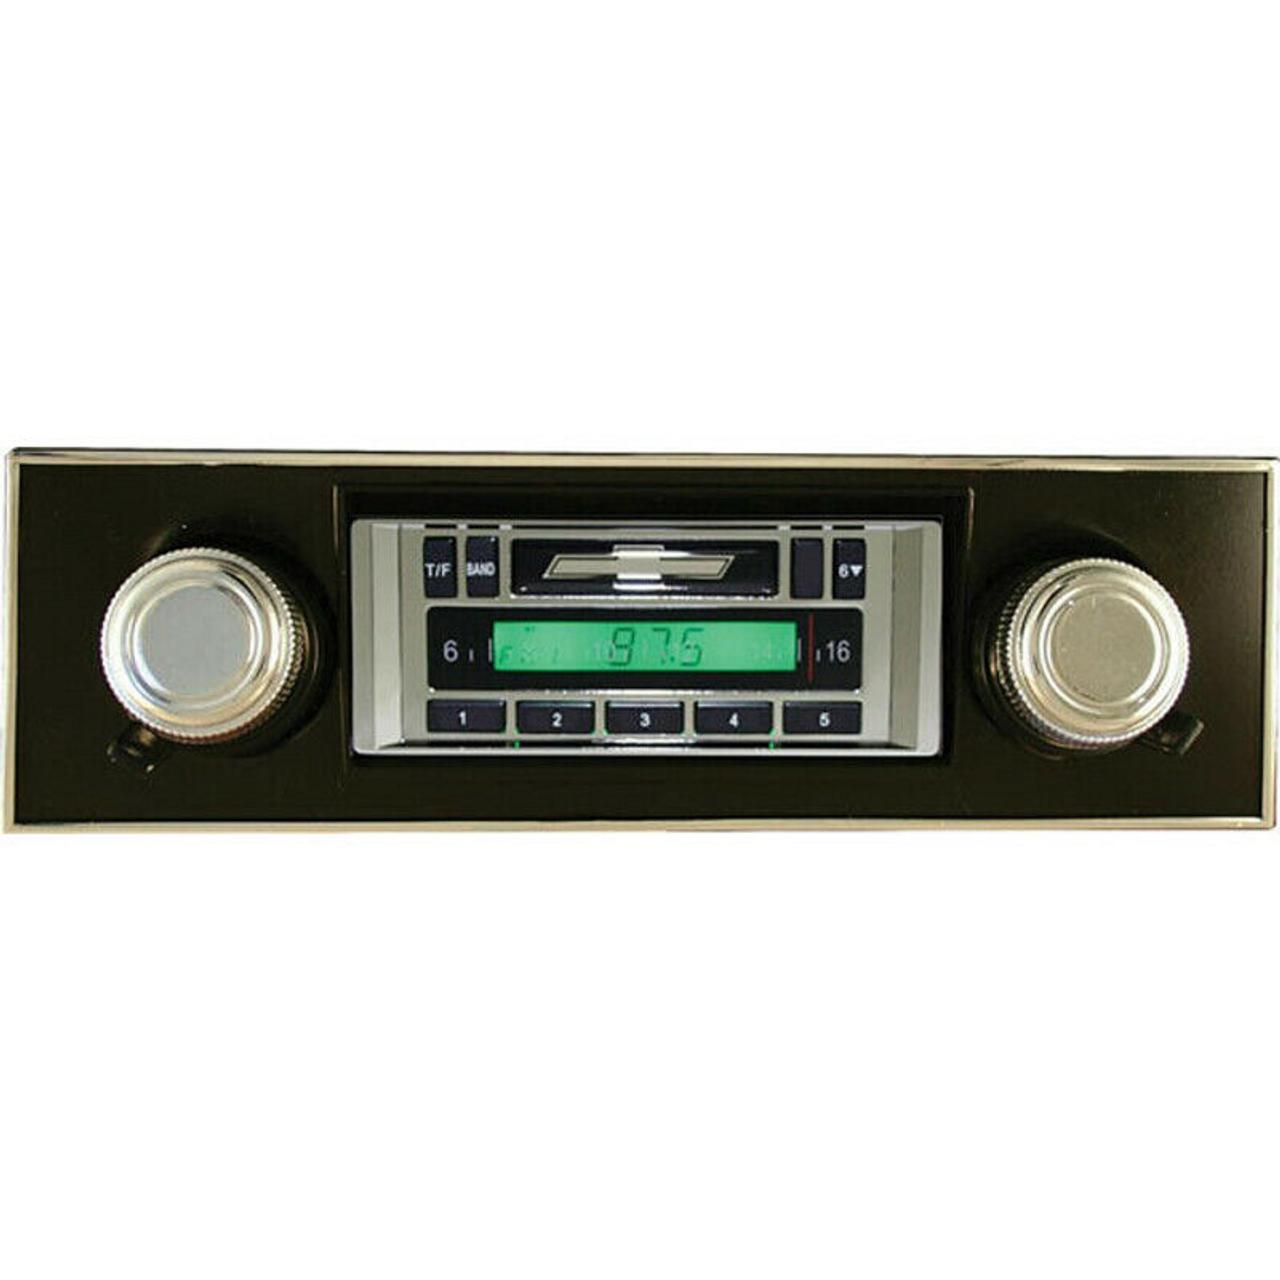 Custom AutoSound USA-630 for a Malibu In Dash AM/FM 93